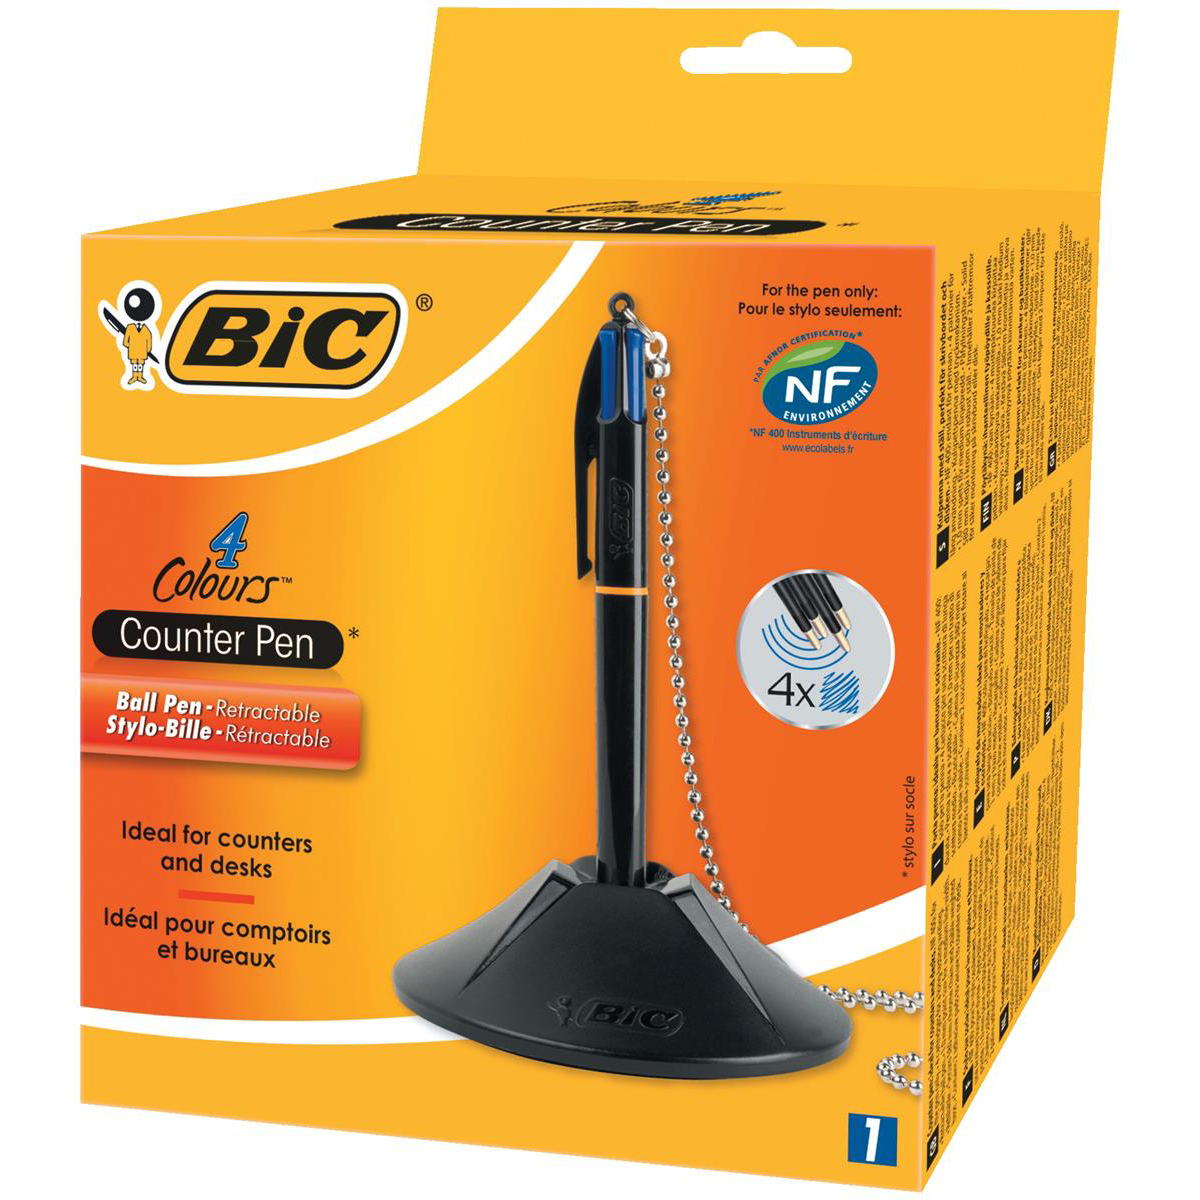 Ball point pens Bic 4 Colour Way Counter Pen Refillable Retractable Medium 1.0mm Tip 0.32mm Line Blue Ref 918515